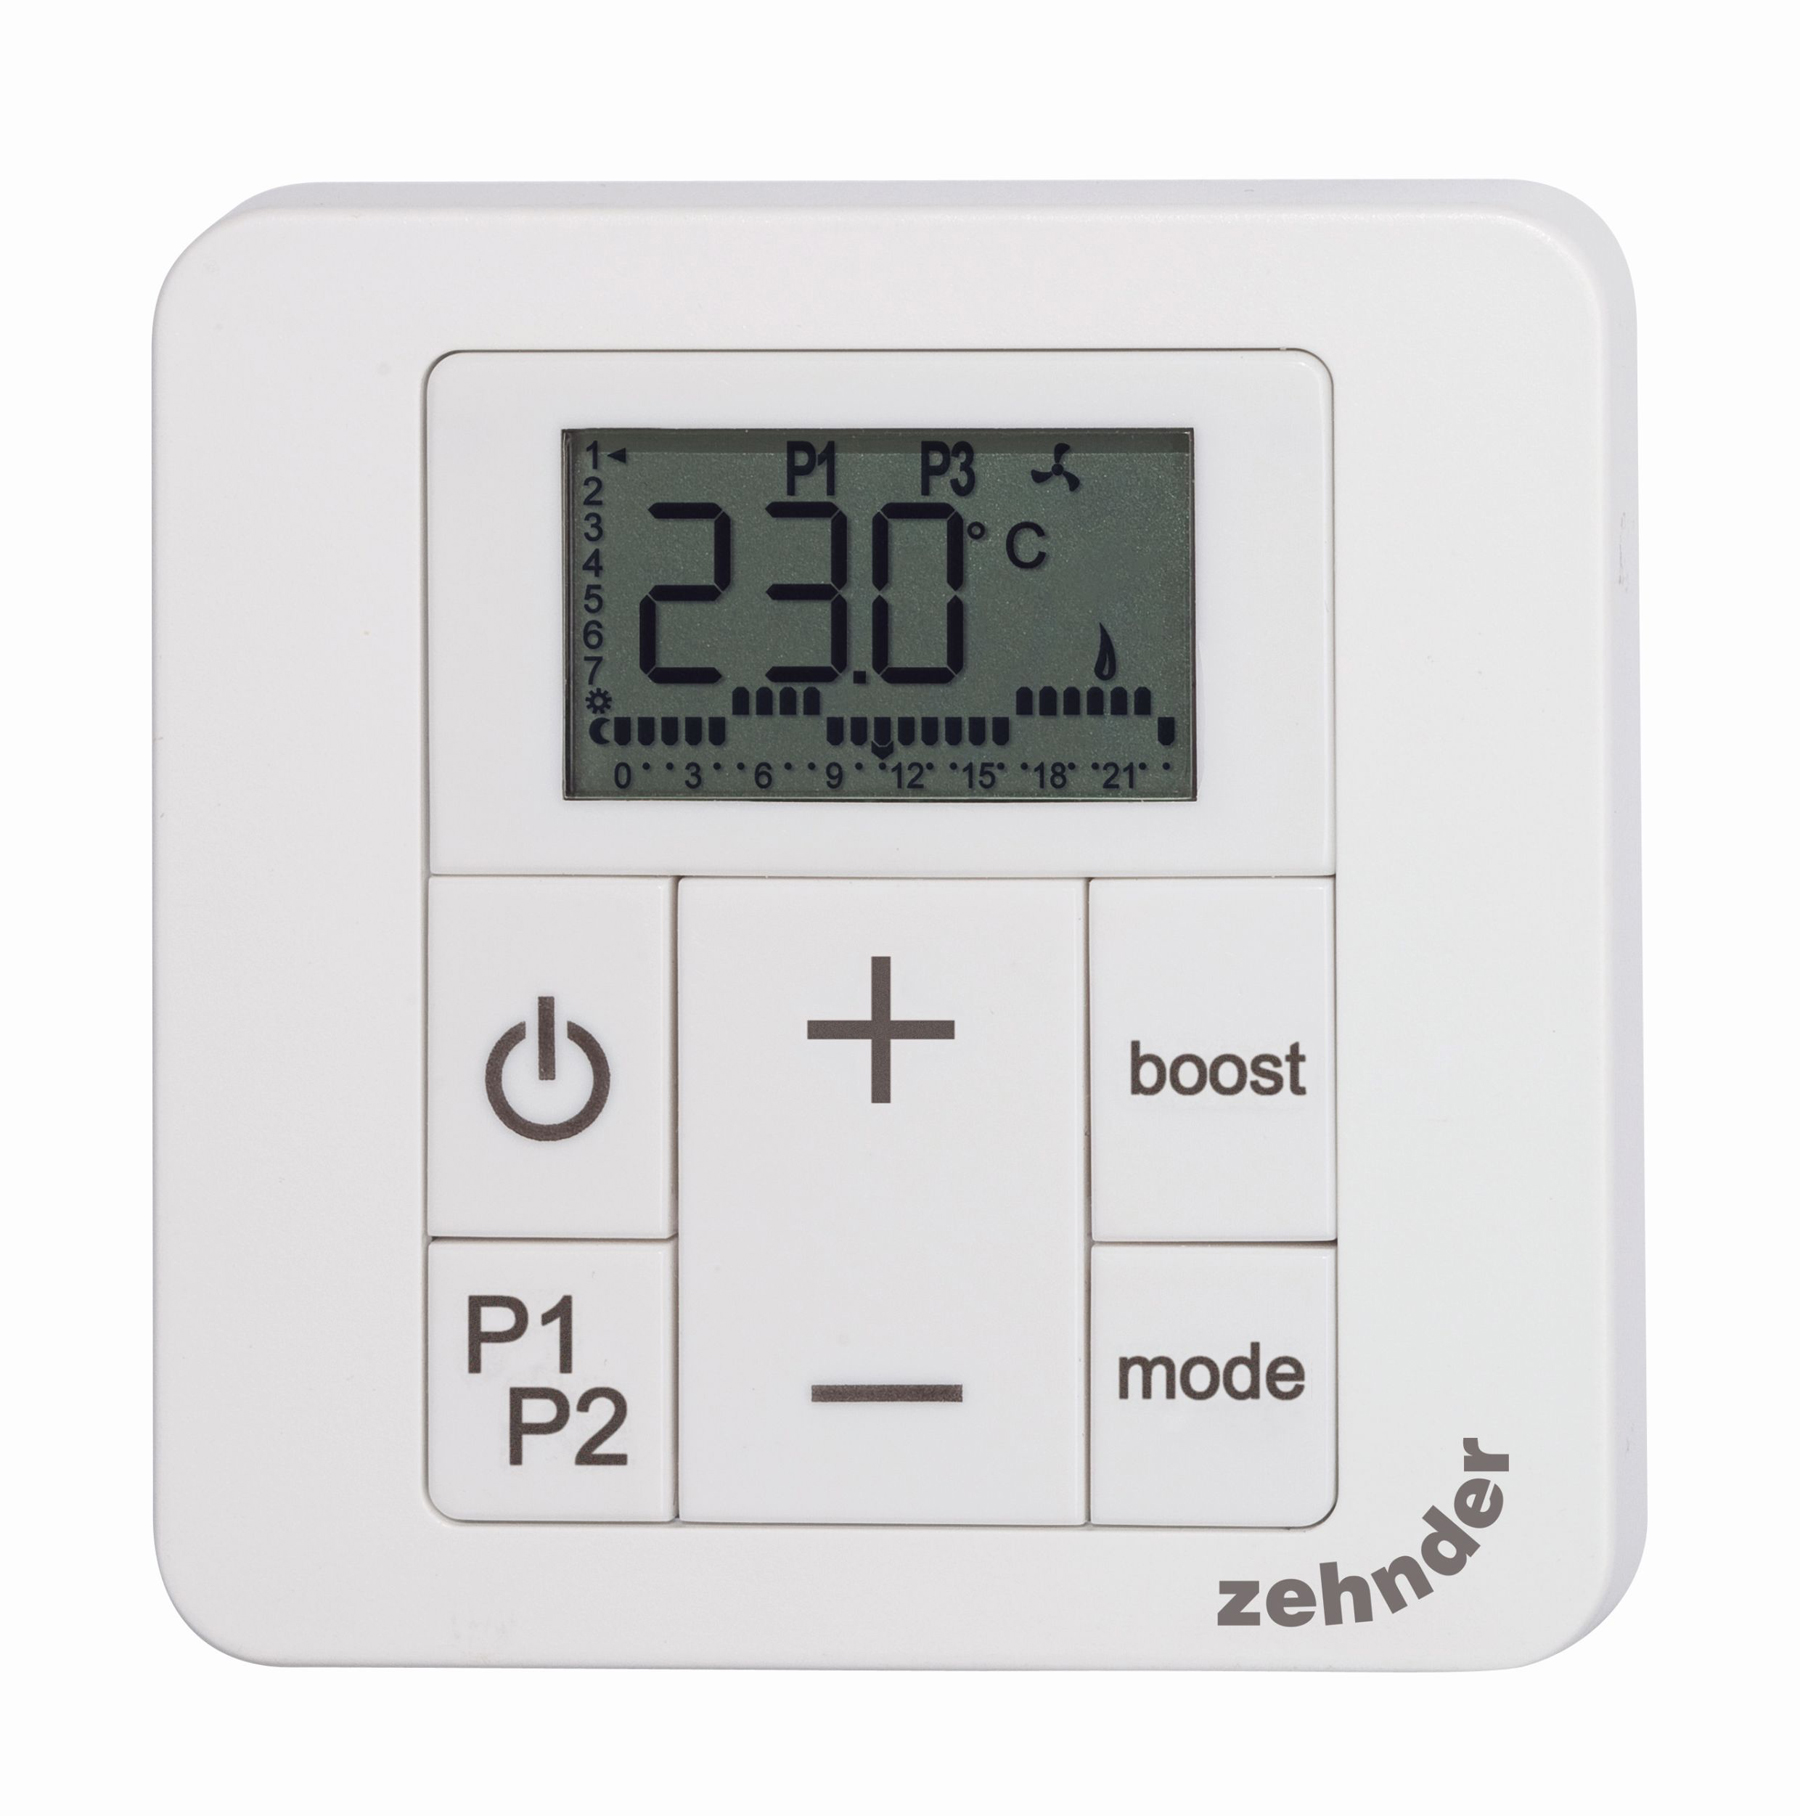 Zehnder RAD control panel model 2 white Print 1